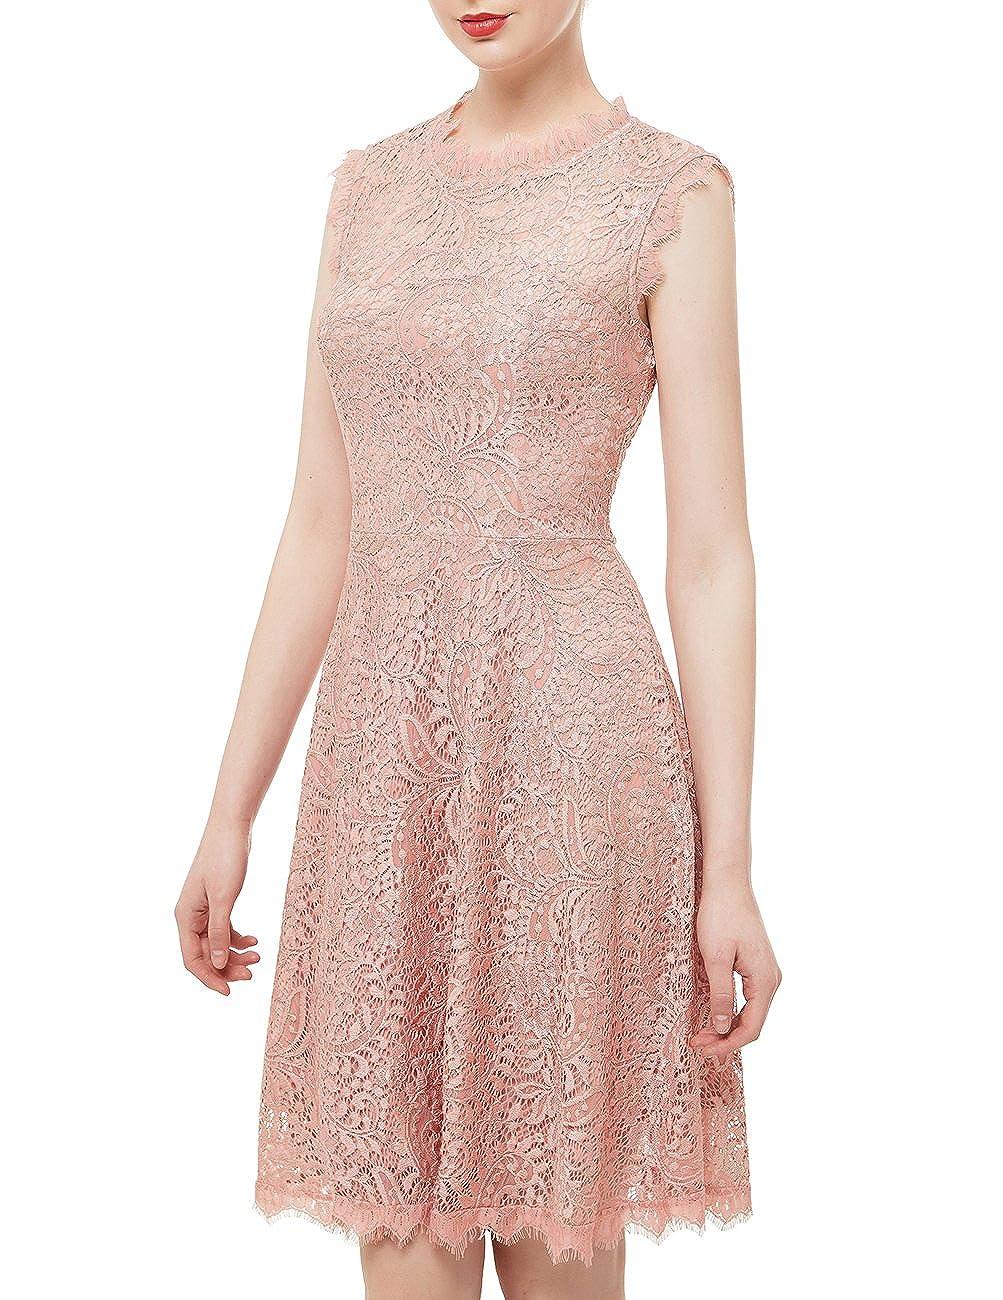 78244dc3c66 DRESSTELLS DresstellsWomen s Elegant Open Back Lace Cocktail Dress for  Special Occasions Blush 3XL at Amazon Women s Clothing store